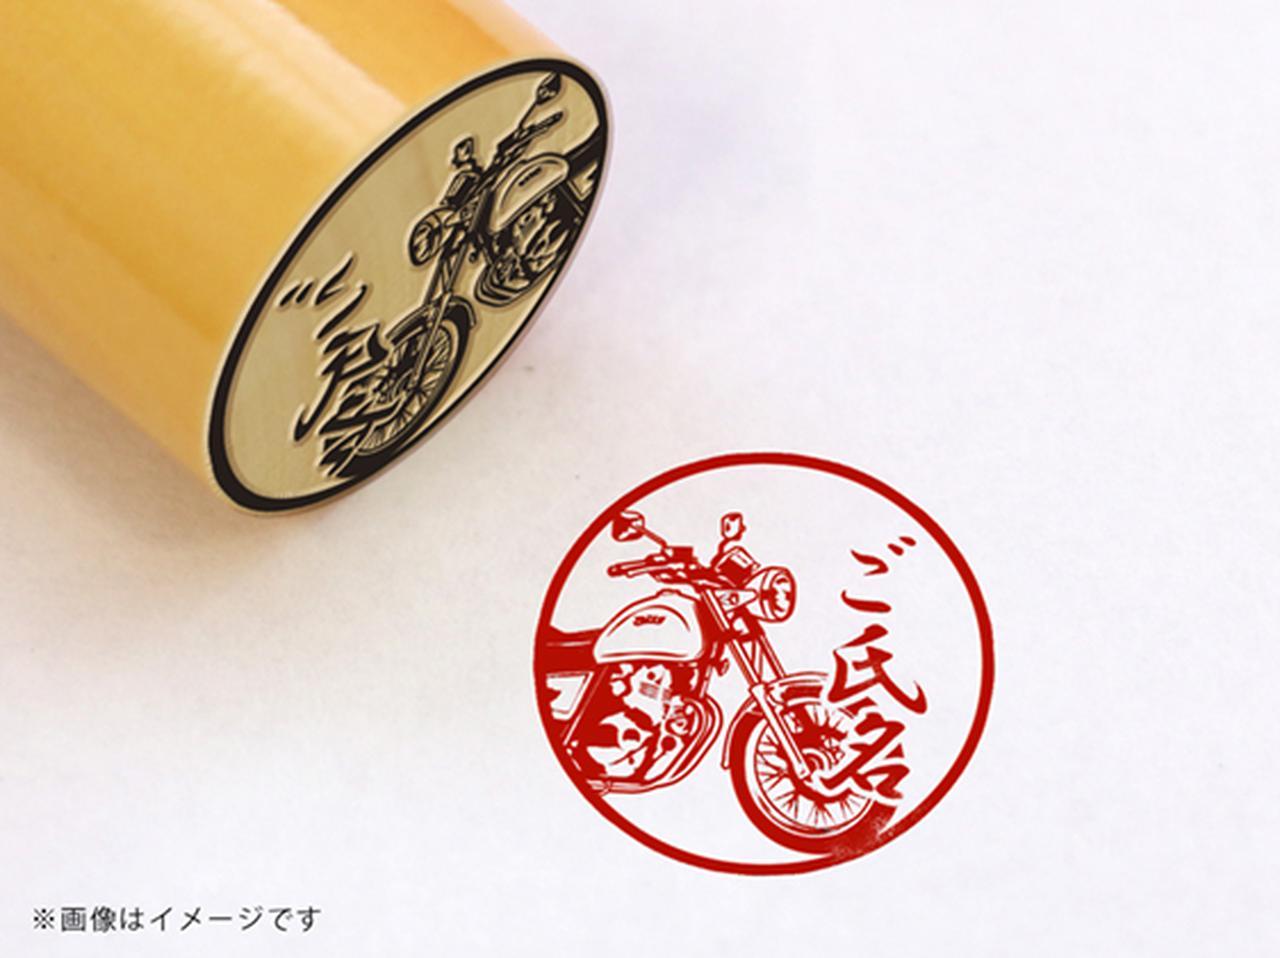 Images : 【SUZUKI】ボルティー・柘植丸印18mm